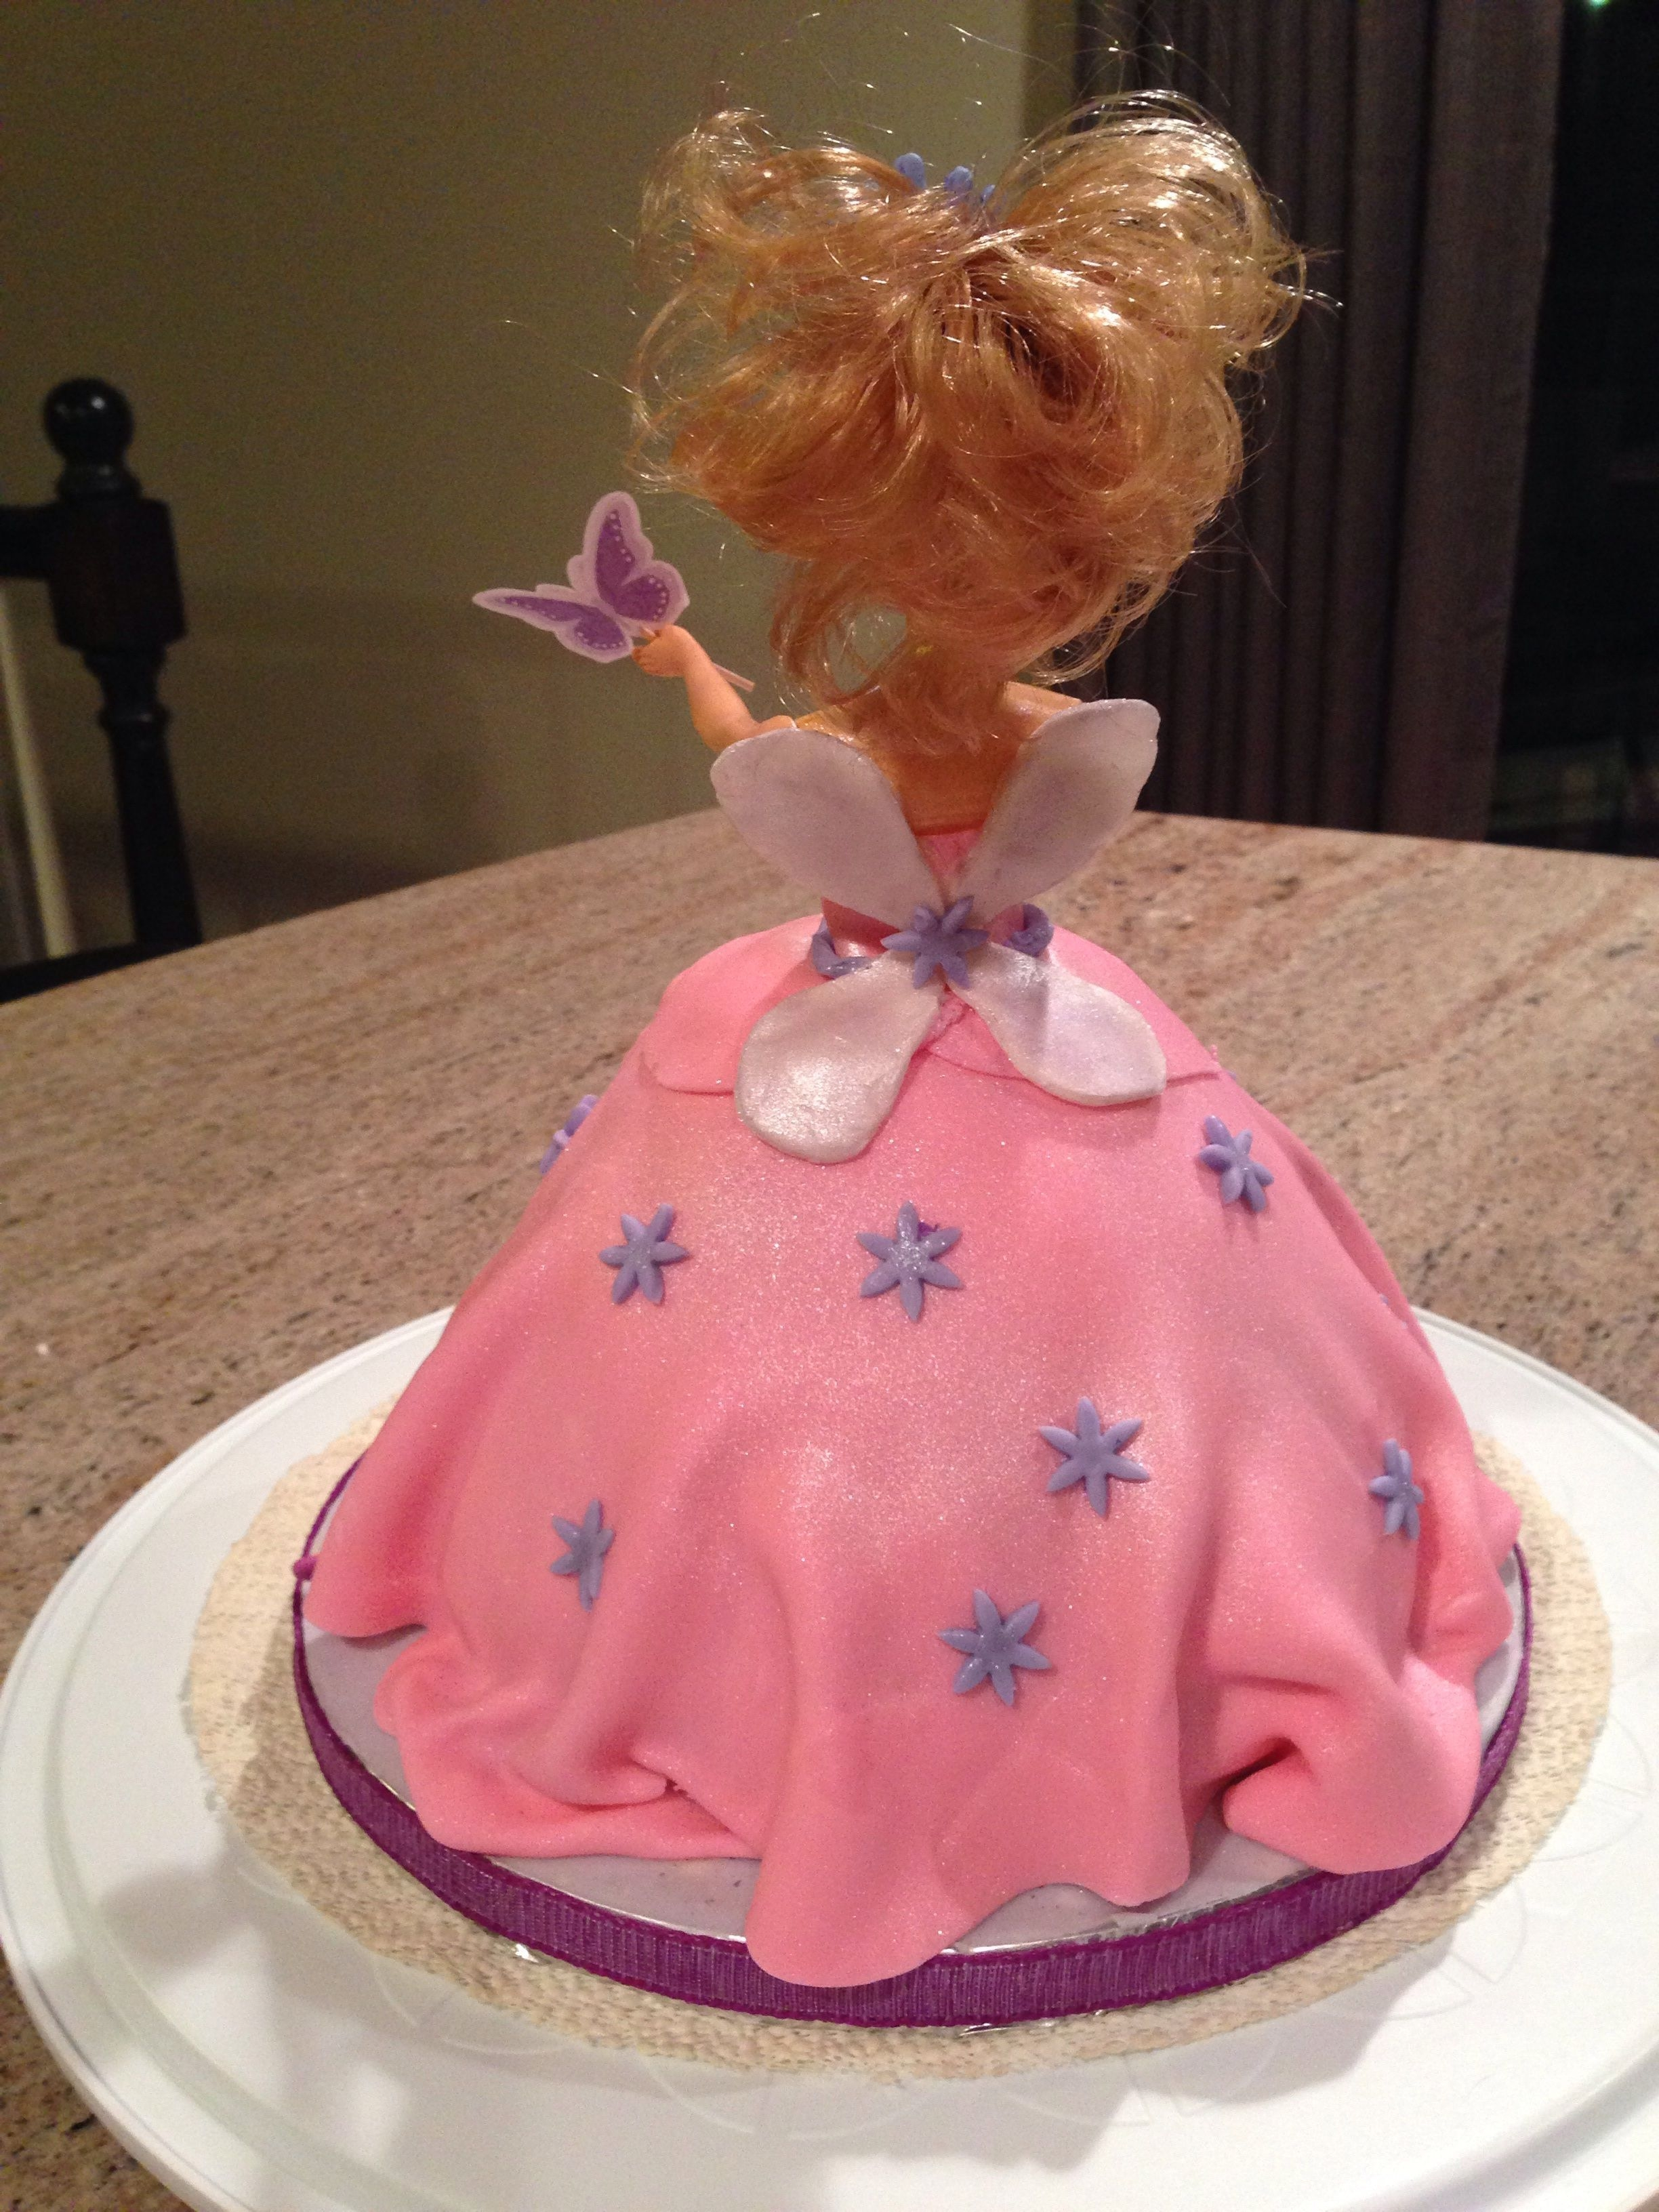 how to make a princess cake with a doll